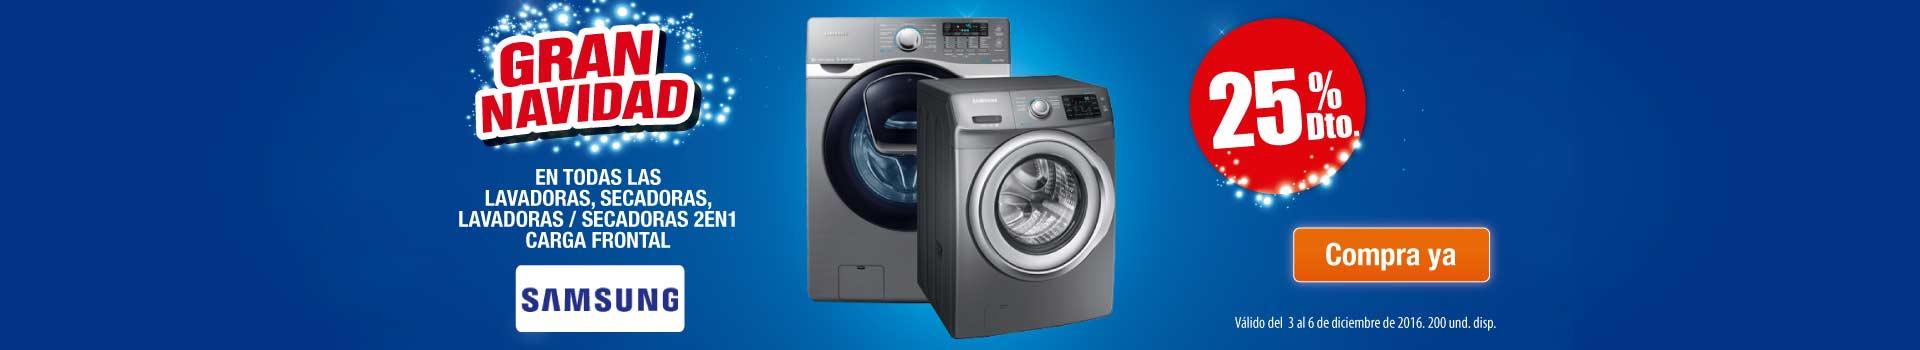 25% Dto. en todo lavado, secado carga frontal Samsung - Hiperofertas - Dic 3